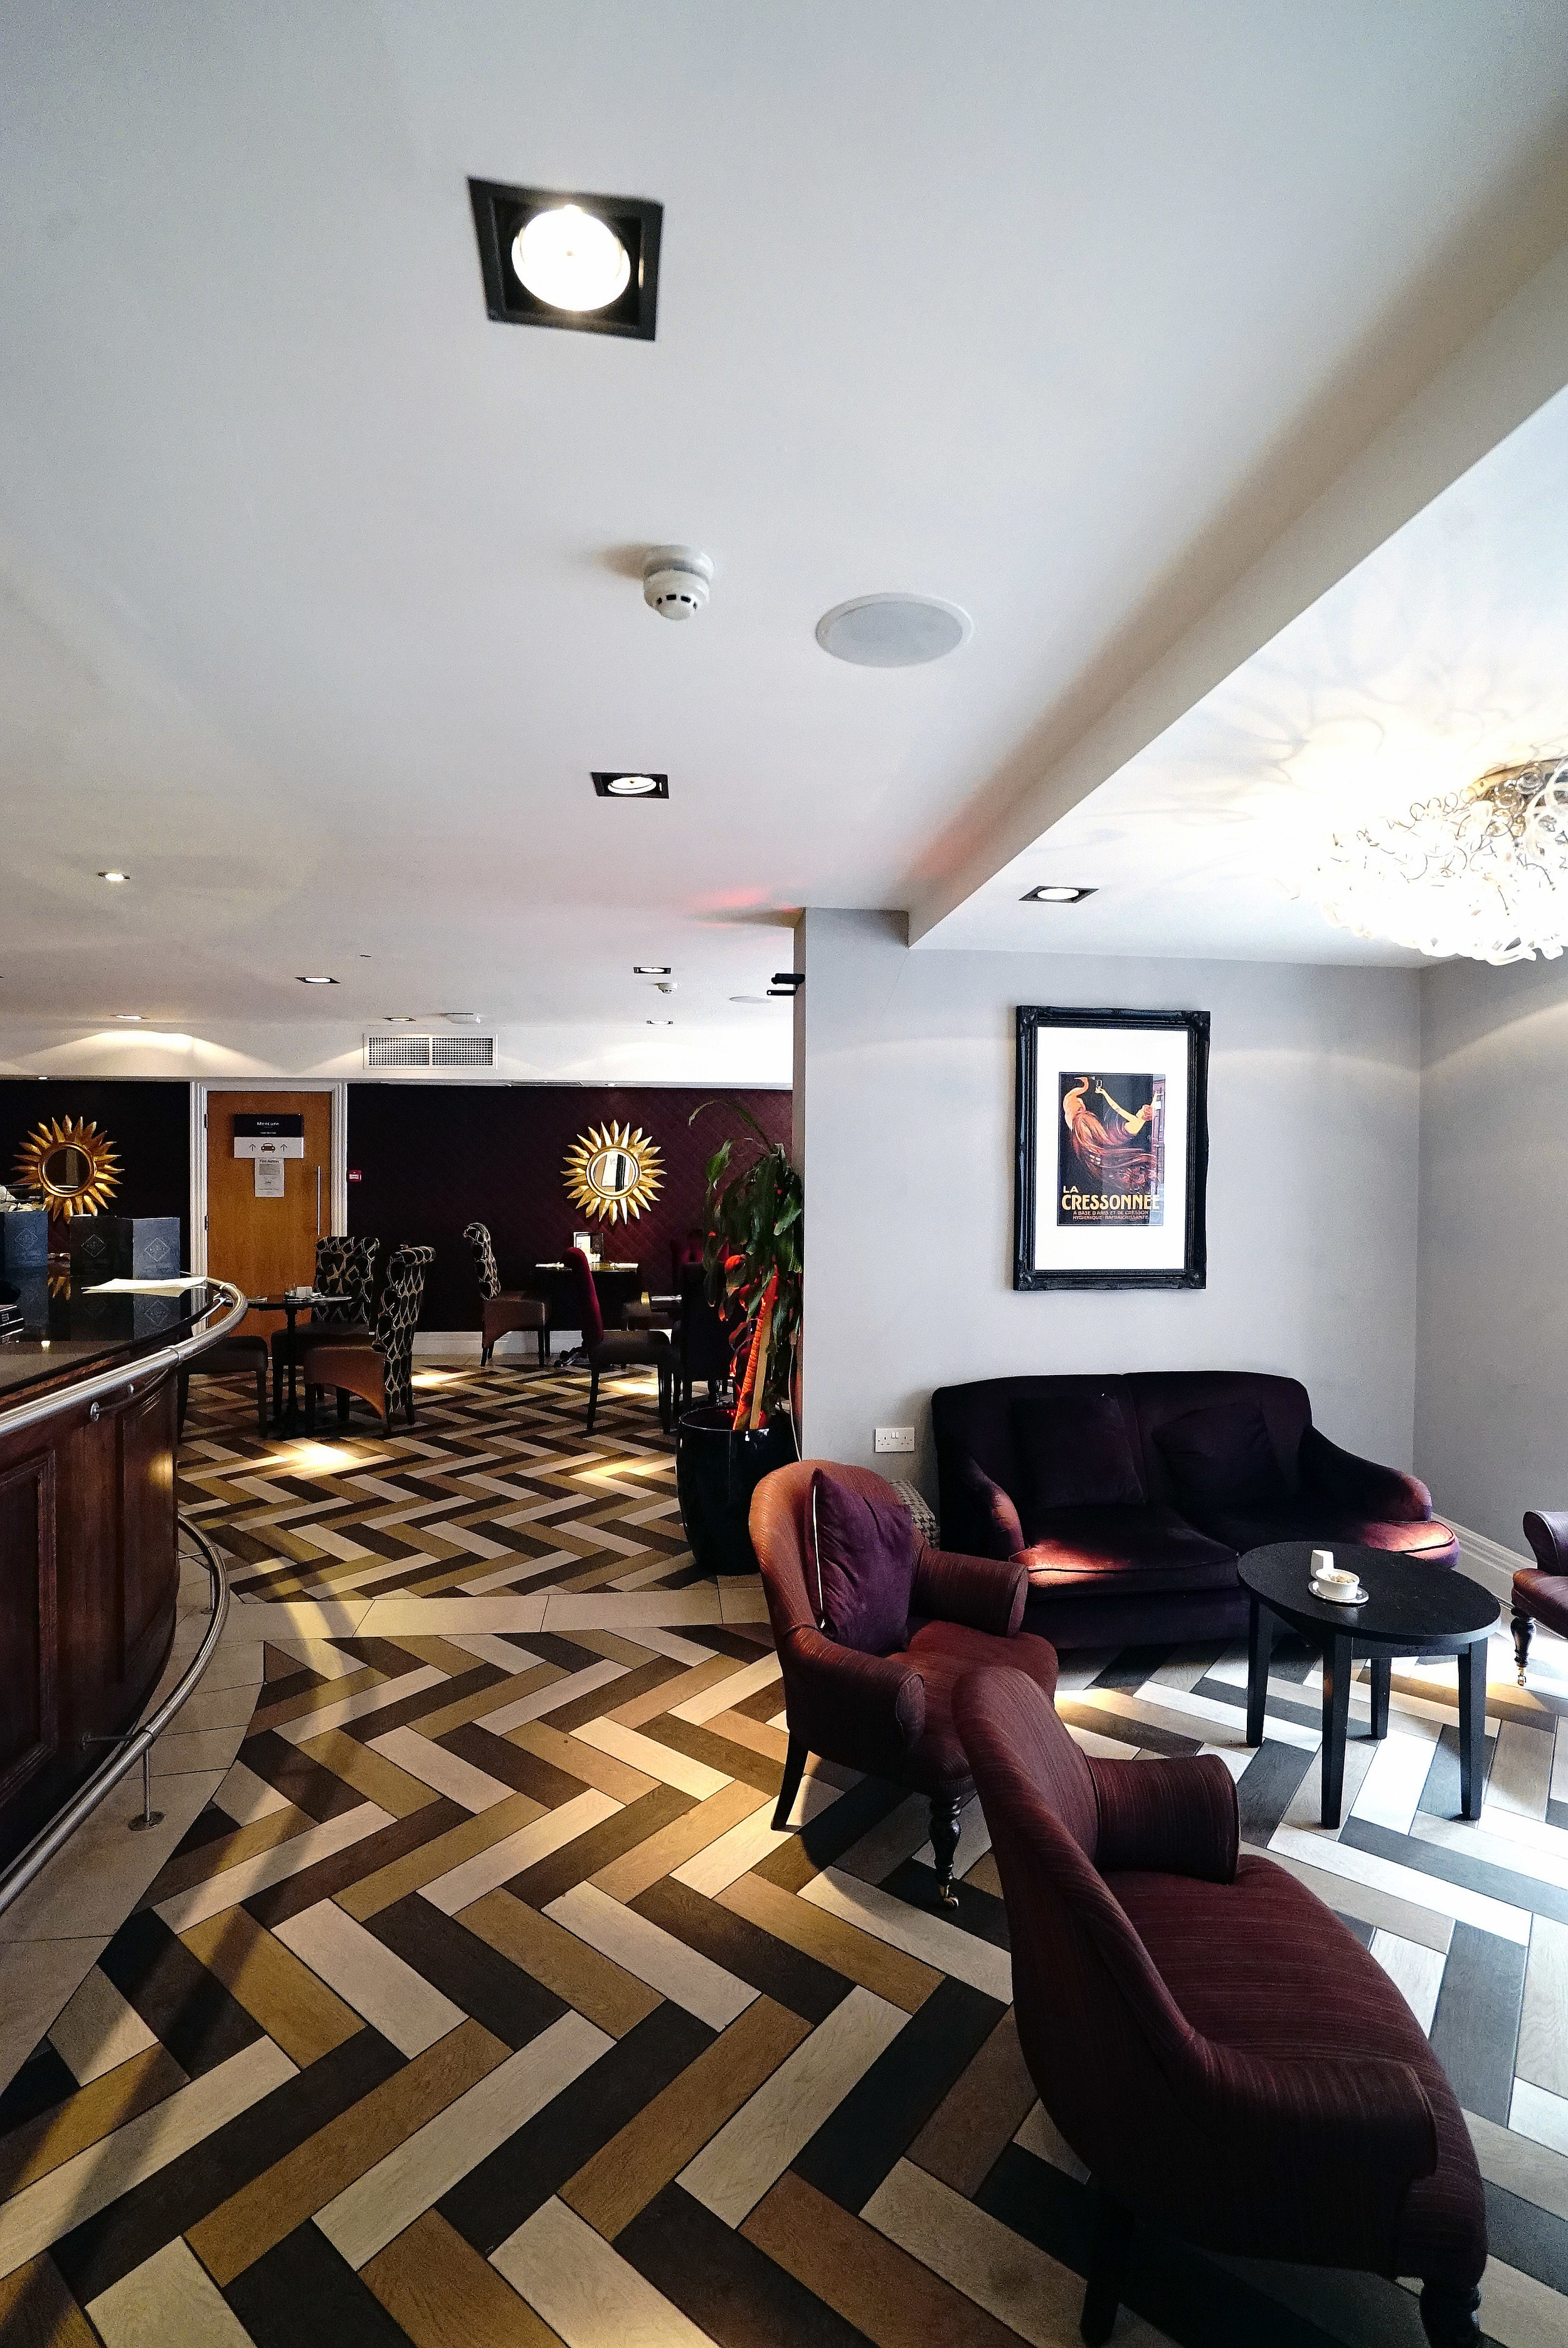 Mercure Darlington Lounge Restaurant.jpg